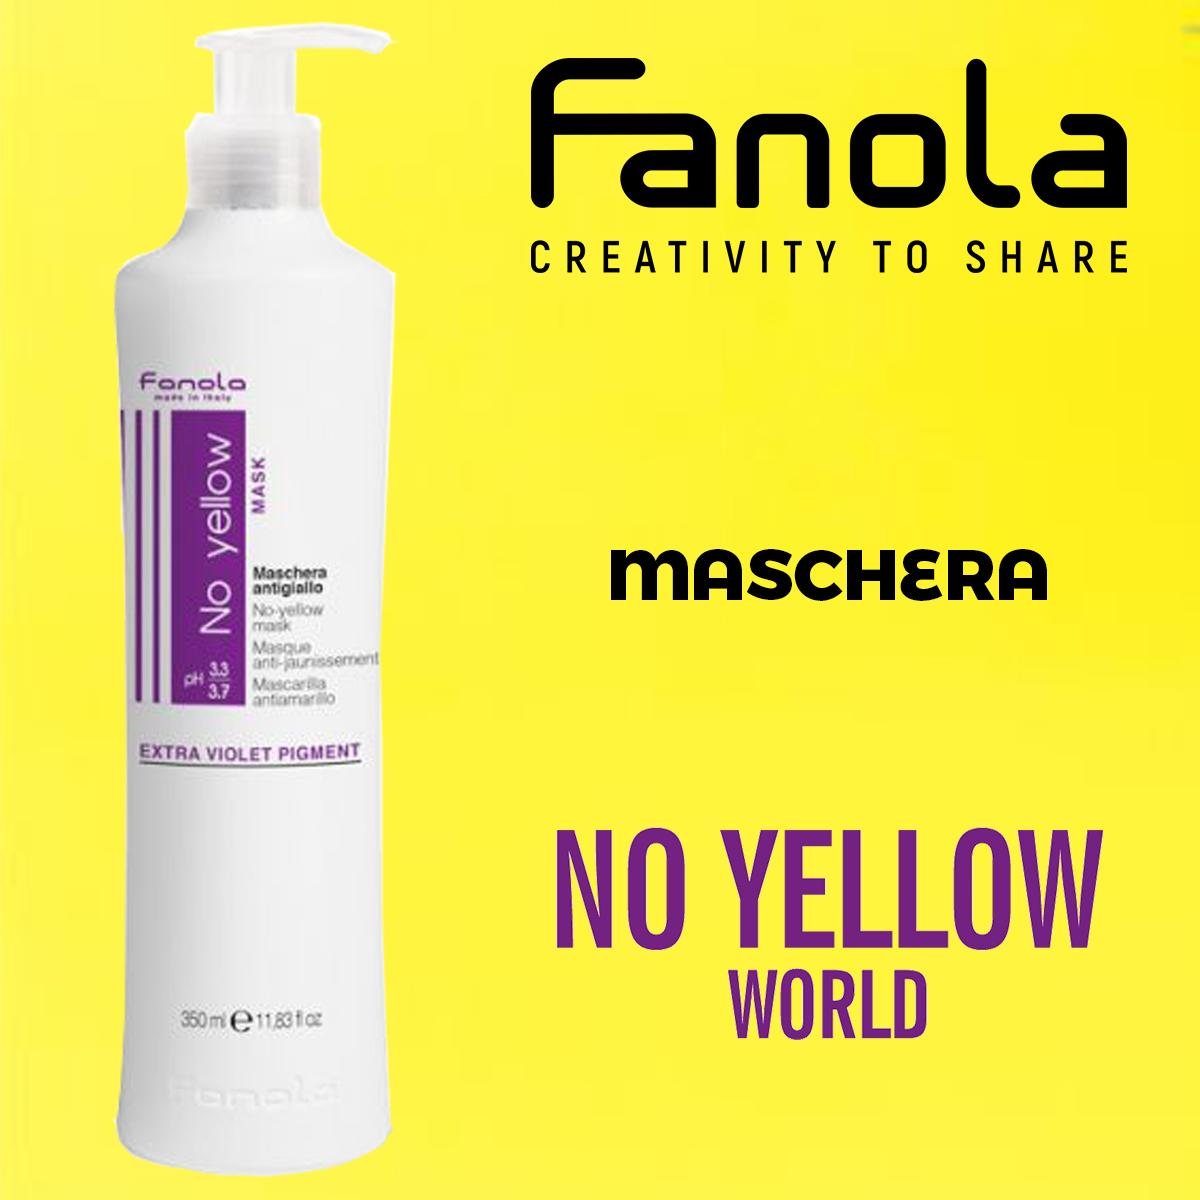 Maschera-fanola-no-yellow